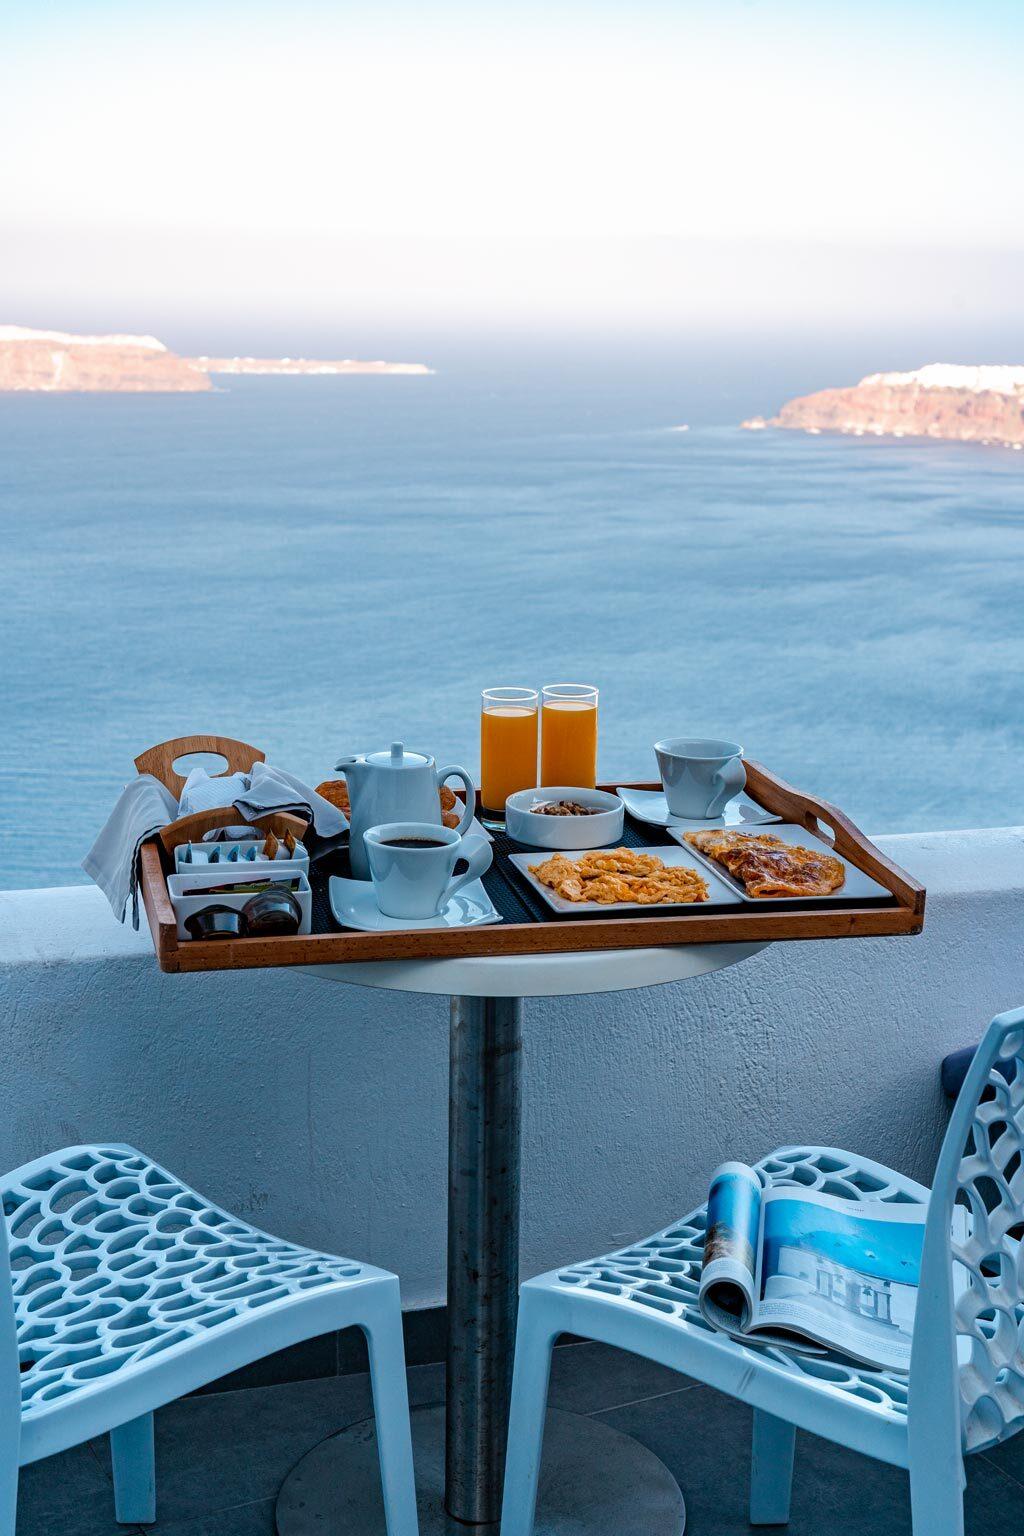 Tradititional Greek Breakfast on the Villa Baclony